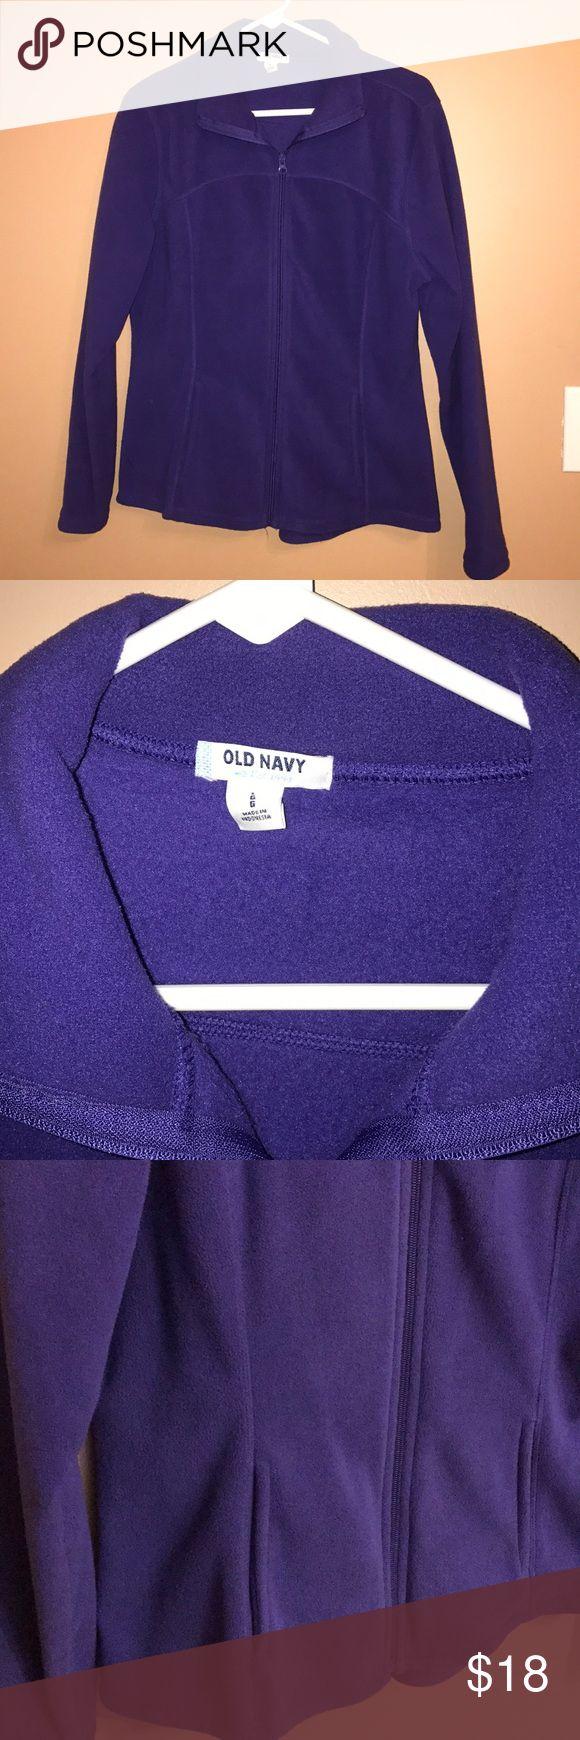 Purple fleece jacket, Large, Old Navy Light weight Old Navy full zip fleece. Dark purple. Large.   Smoke free, 🐶Friendly home. Old Navy Jackets & Coats